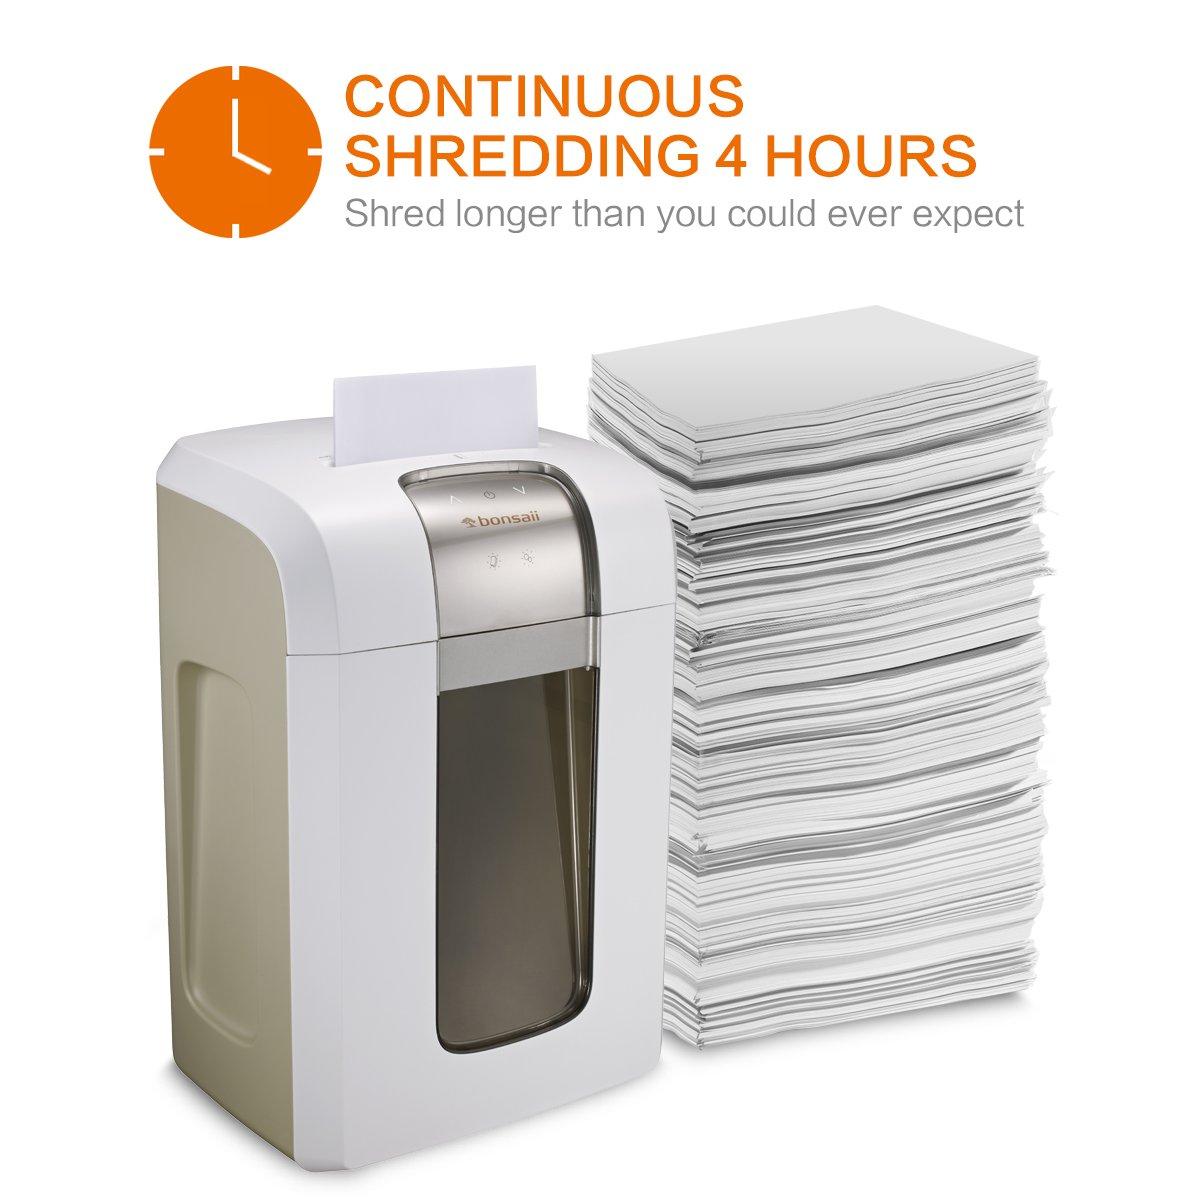 Amazon.com : Bonsaii Paper Shredder, 240 Minutes Continuous ...